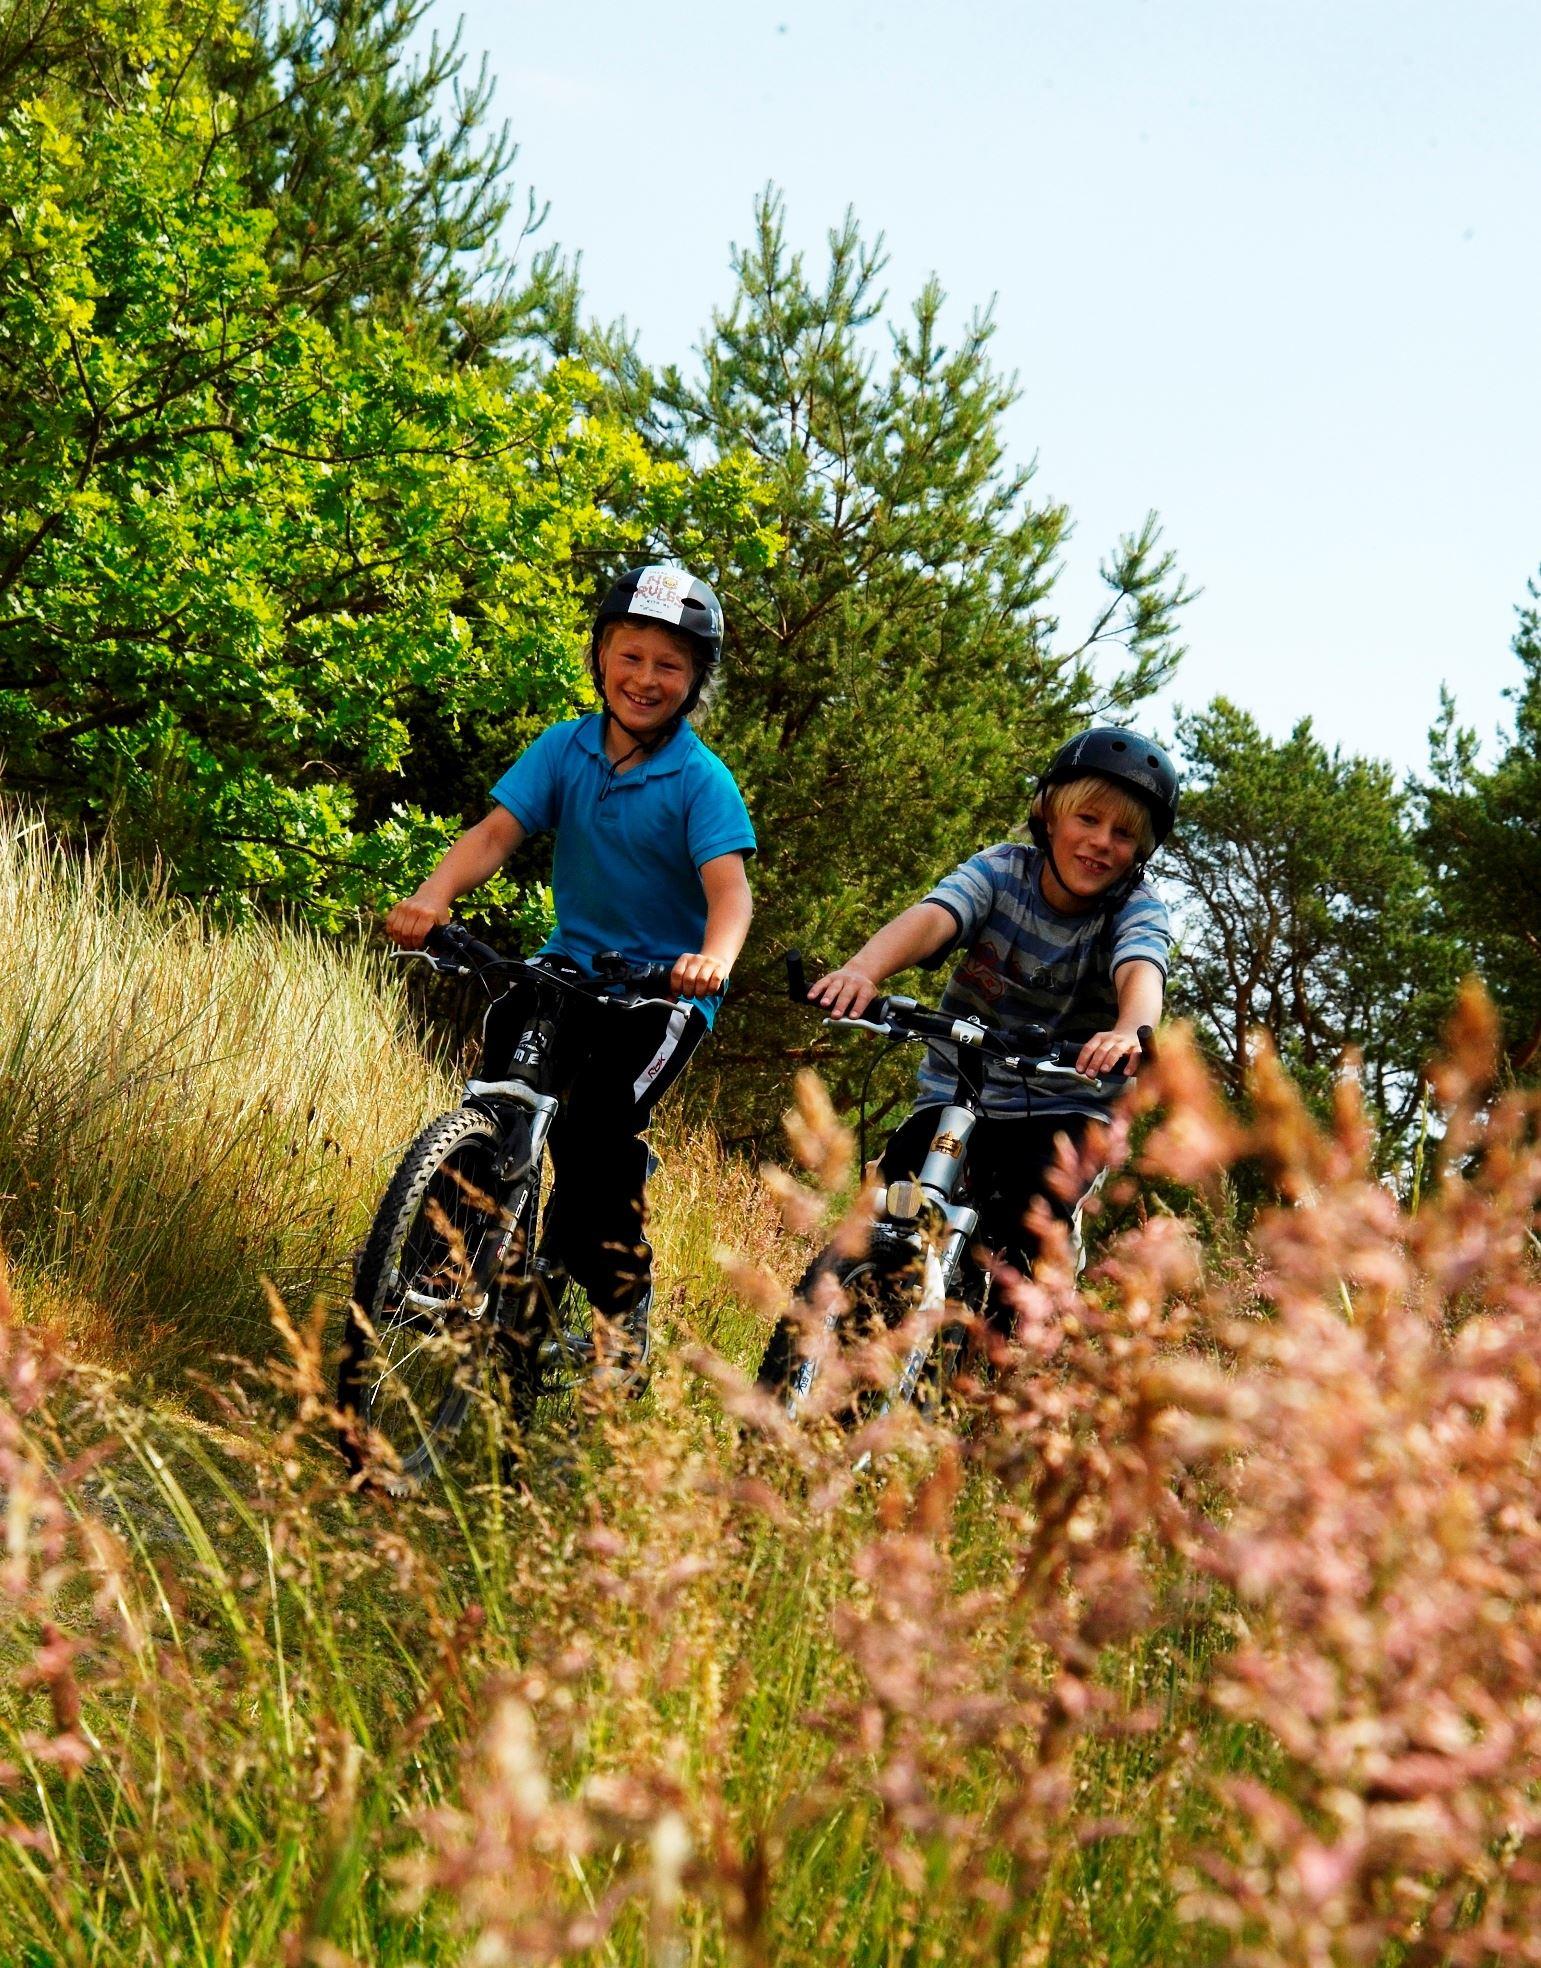 Bike rental - Hälleviks havsbad